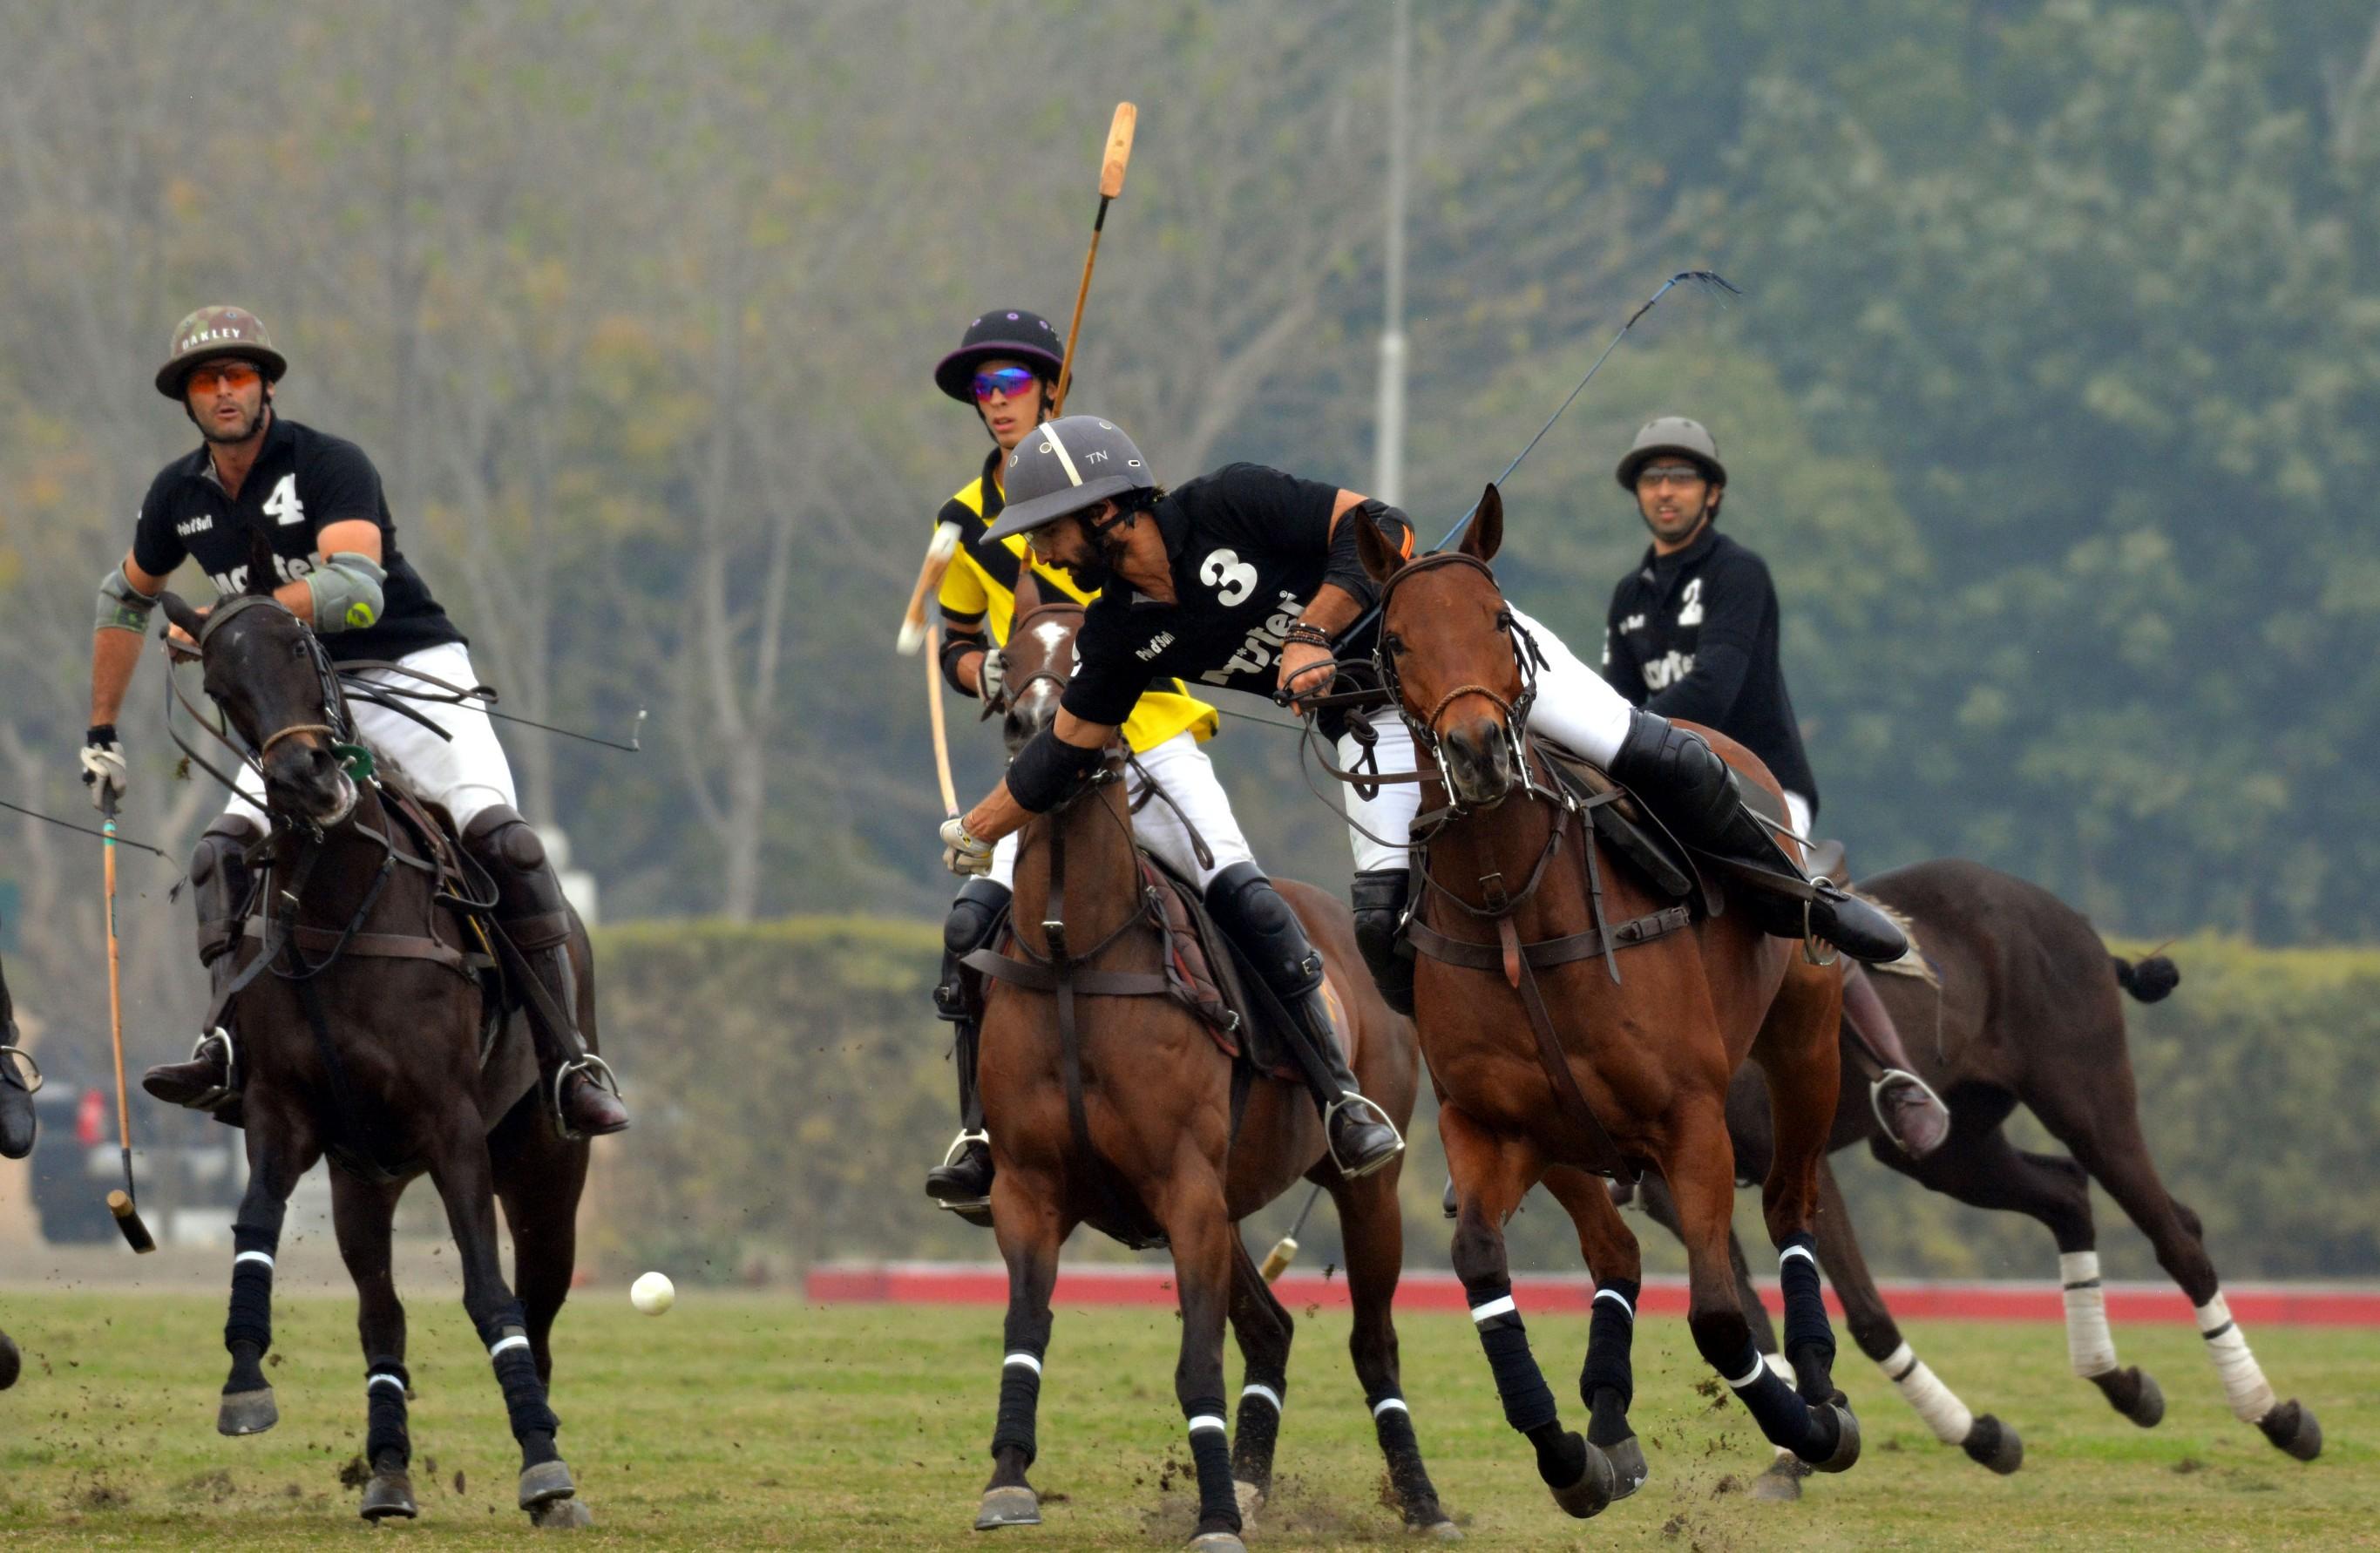 Hamdan Aibak Polo Cup 2019